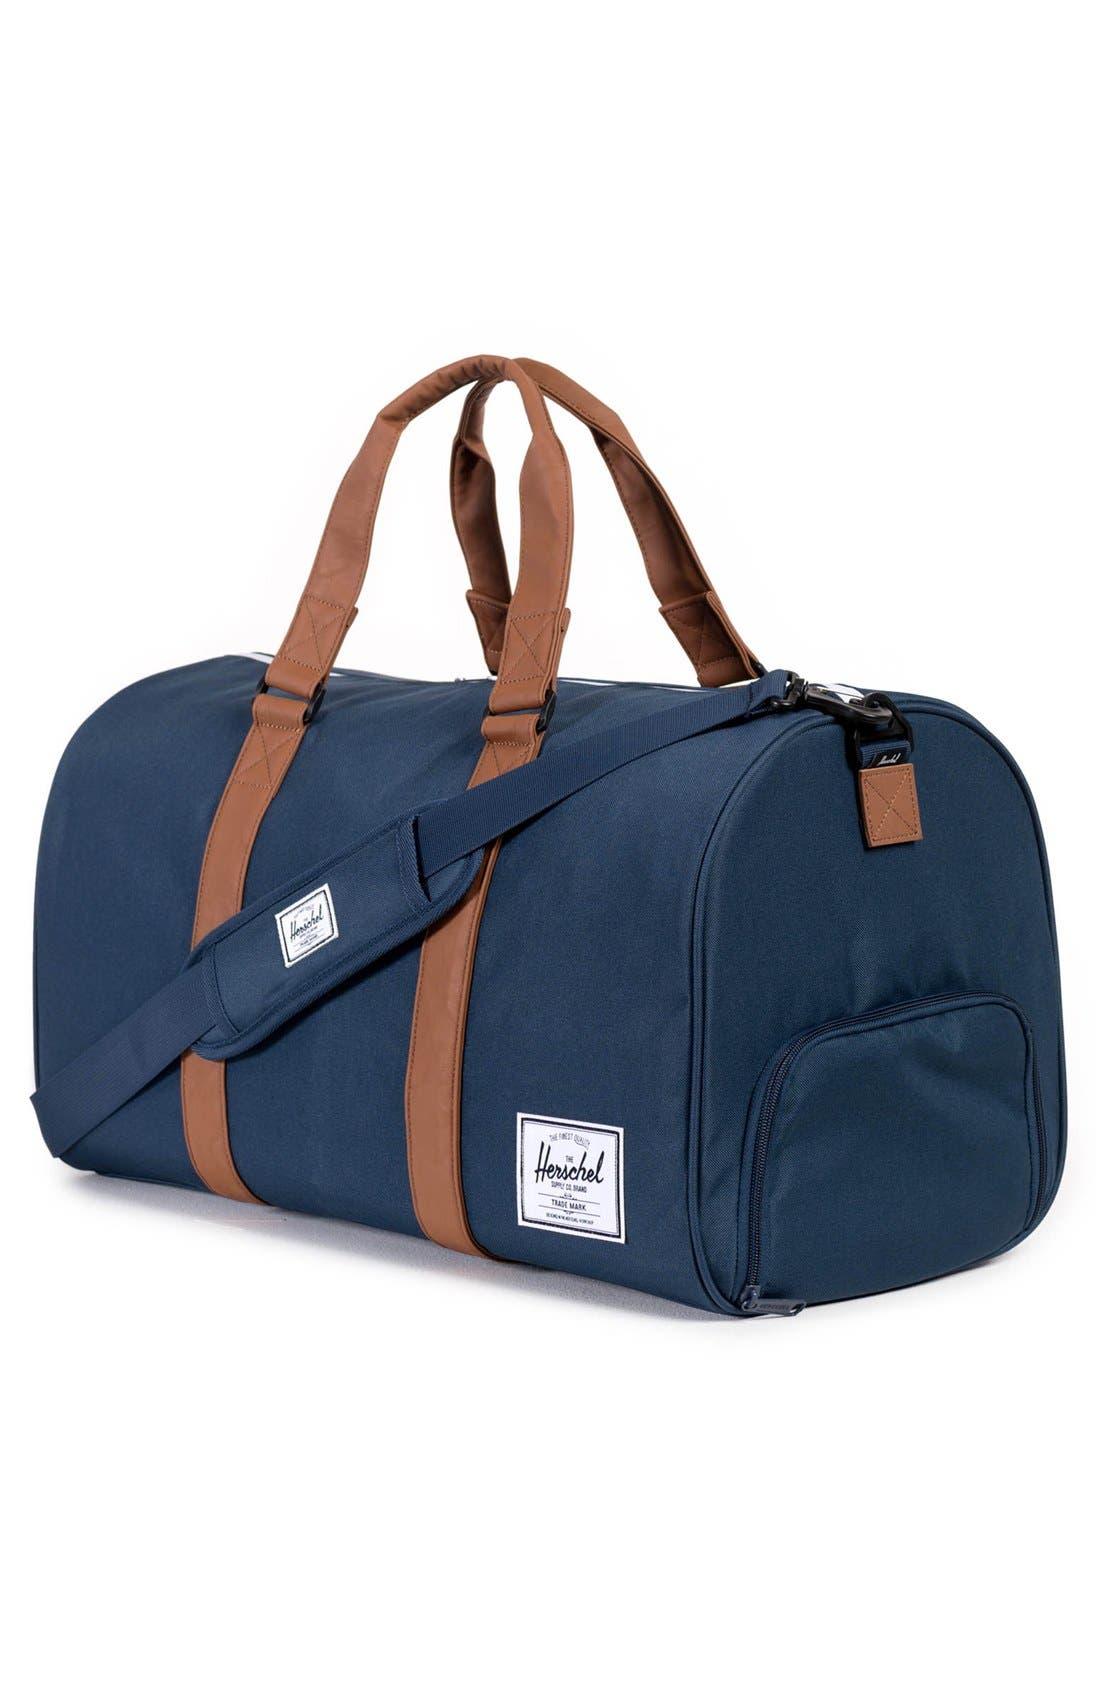 Alternate Image 3  - Herschel Supply Co. 'Novel' Duffel Bag